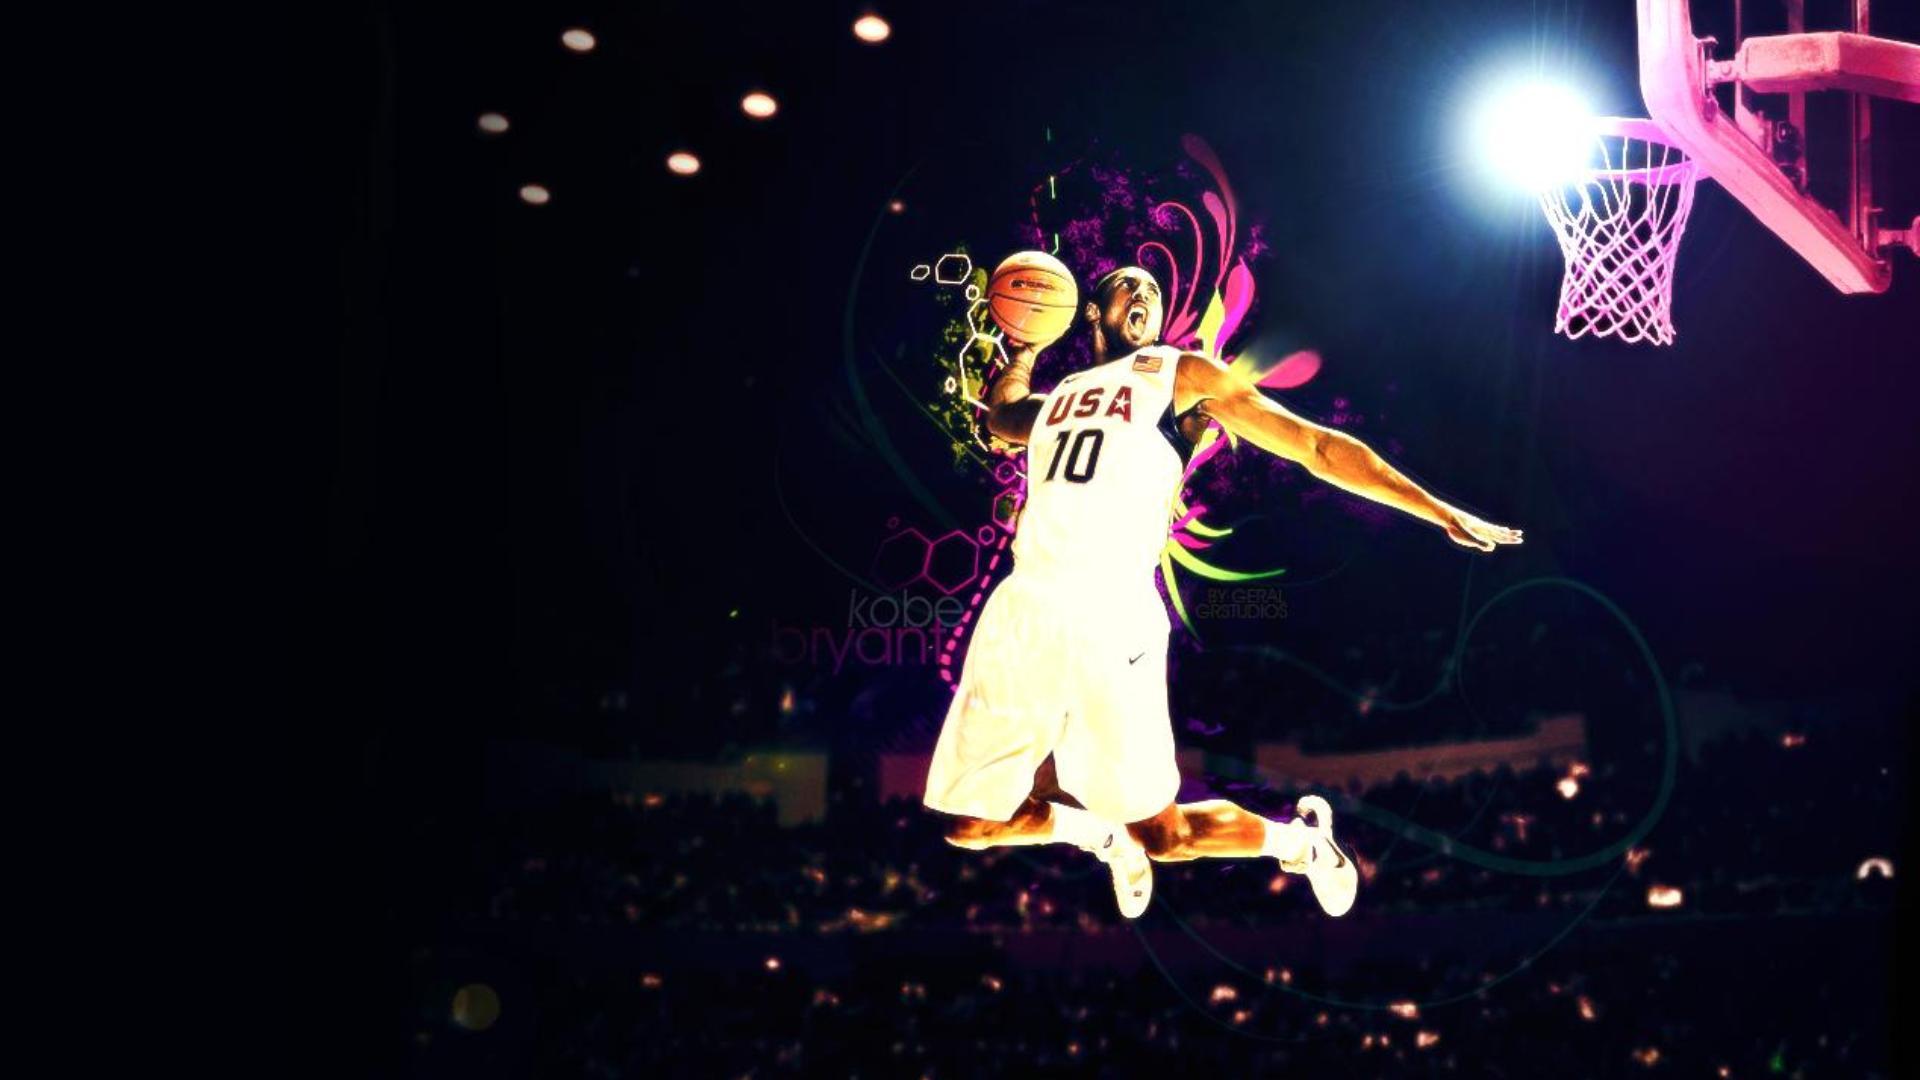 Kobe Bryant Dunk On Lebron James Wallpapers Hd Sports 1920x1080 Download Hd Wallpaper Wallpapertip